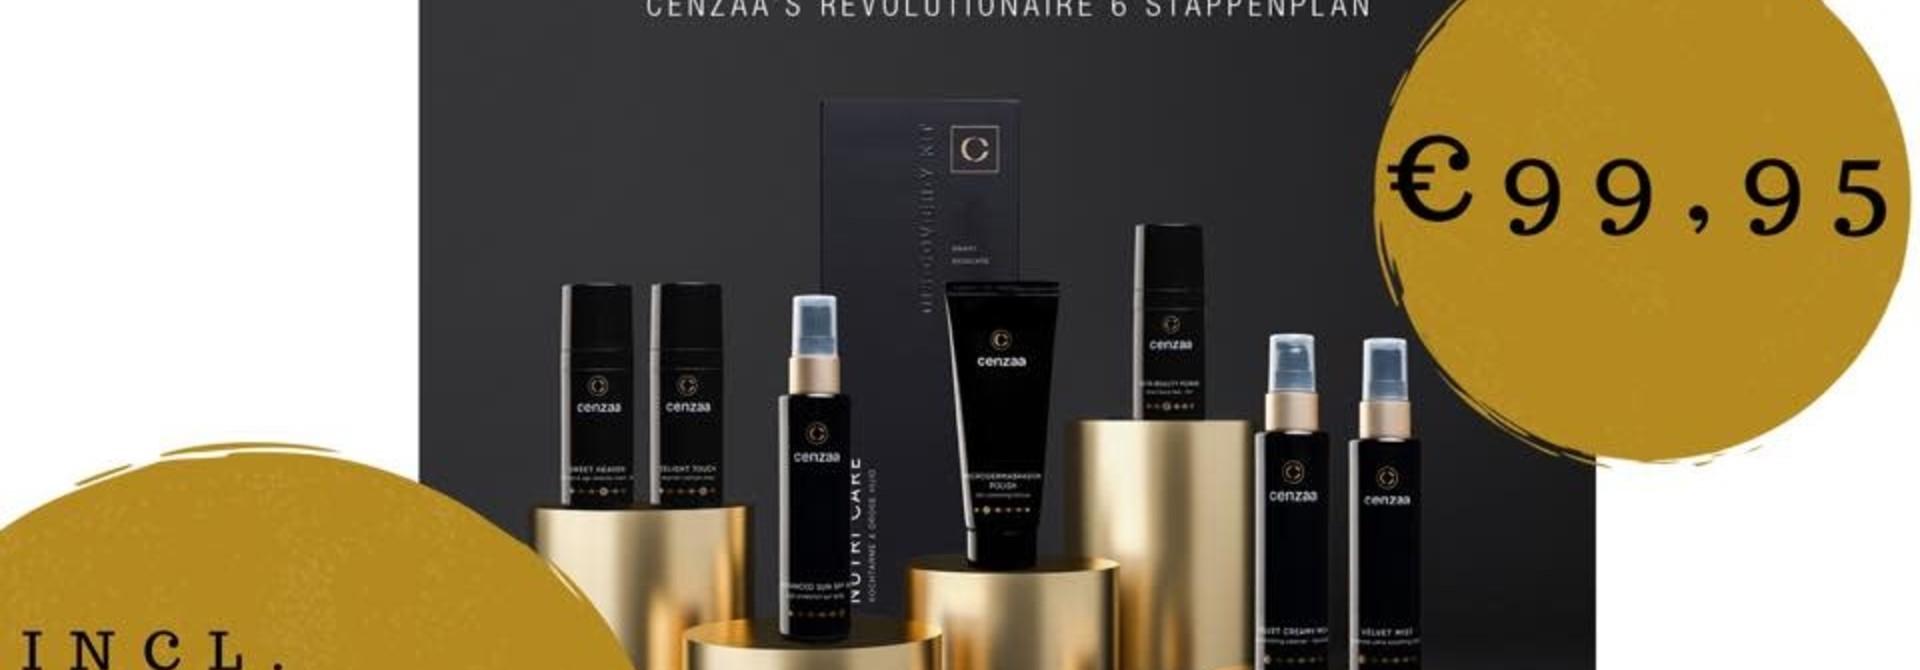 Cenzaa Discovery Kit - Nitricare 2.0